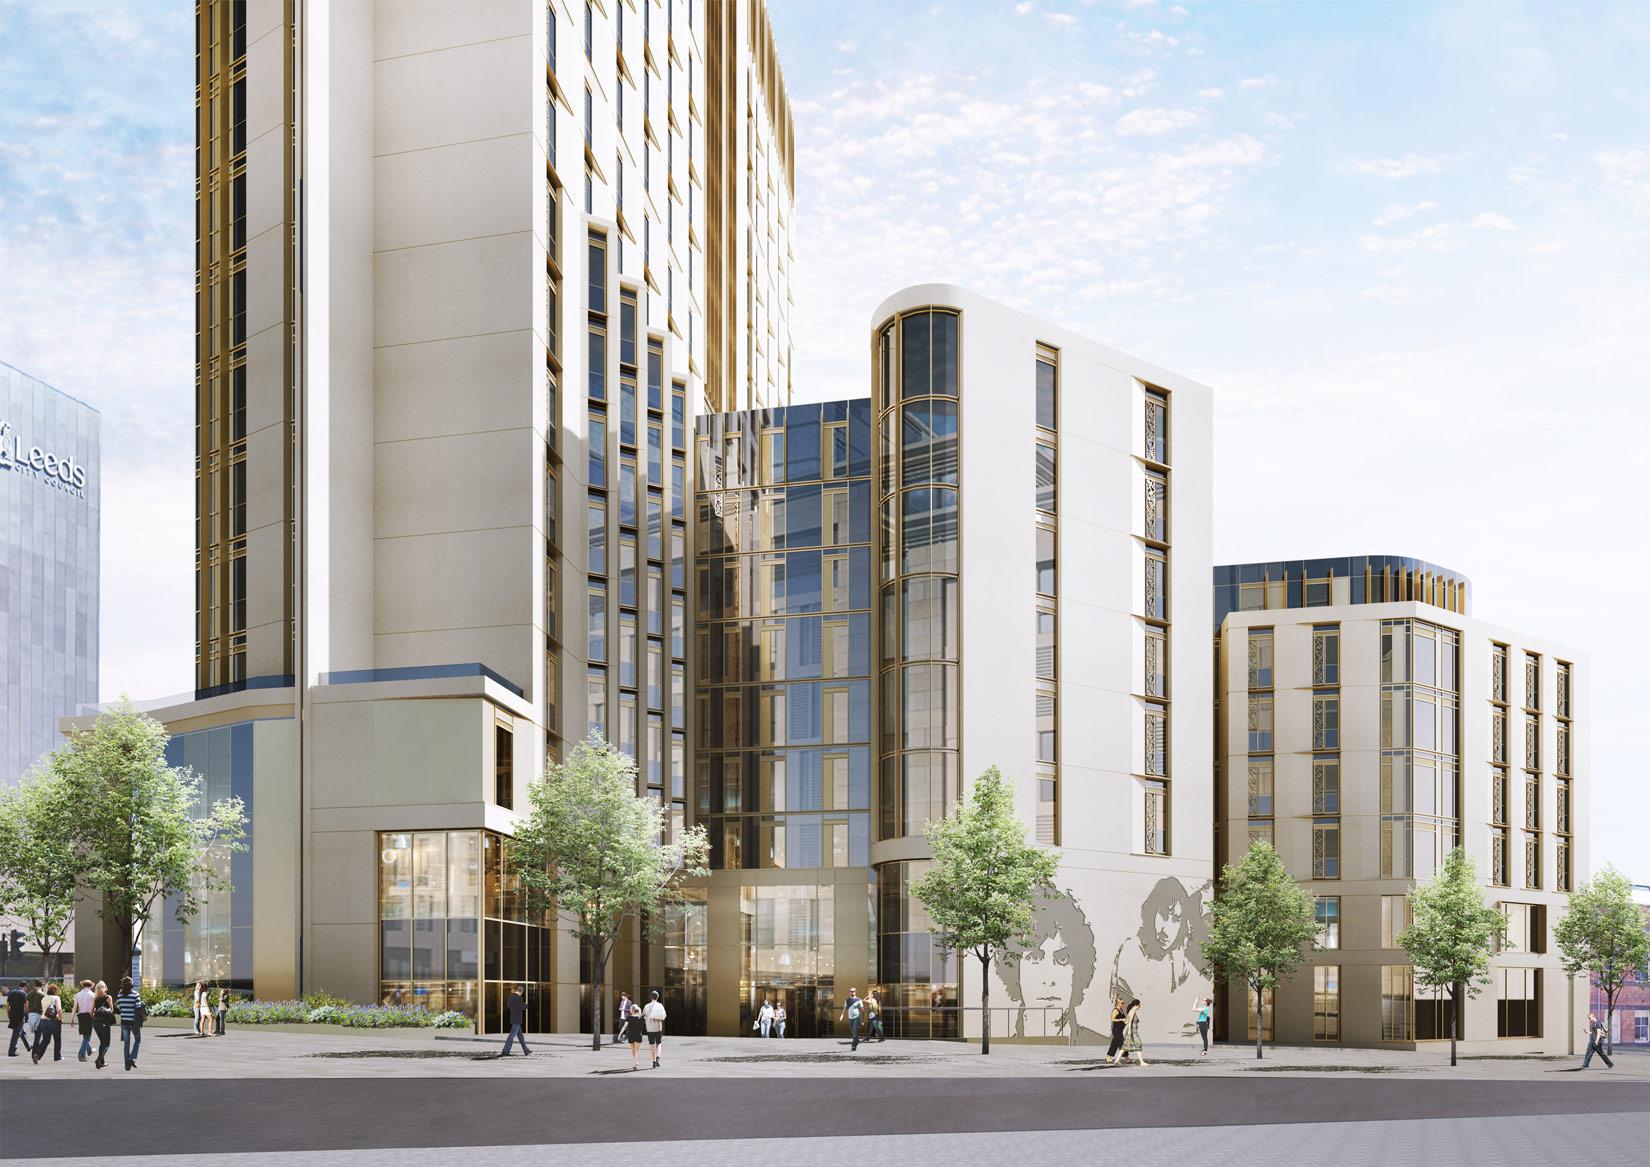 Technology Campus, Cookridge Street, Leeds, 3D Visual of the approach